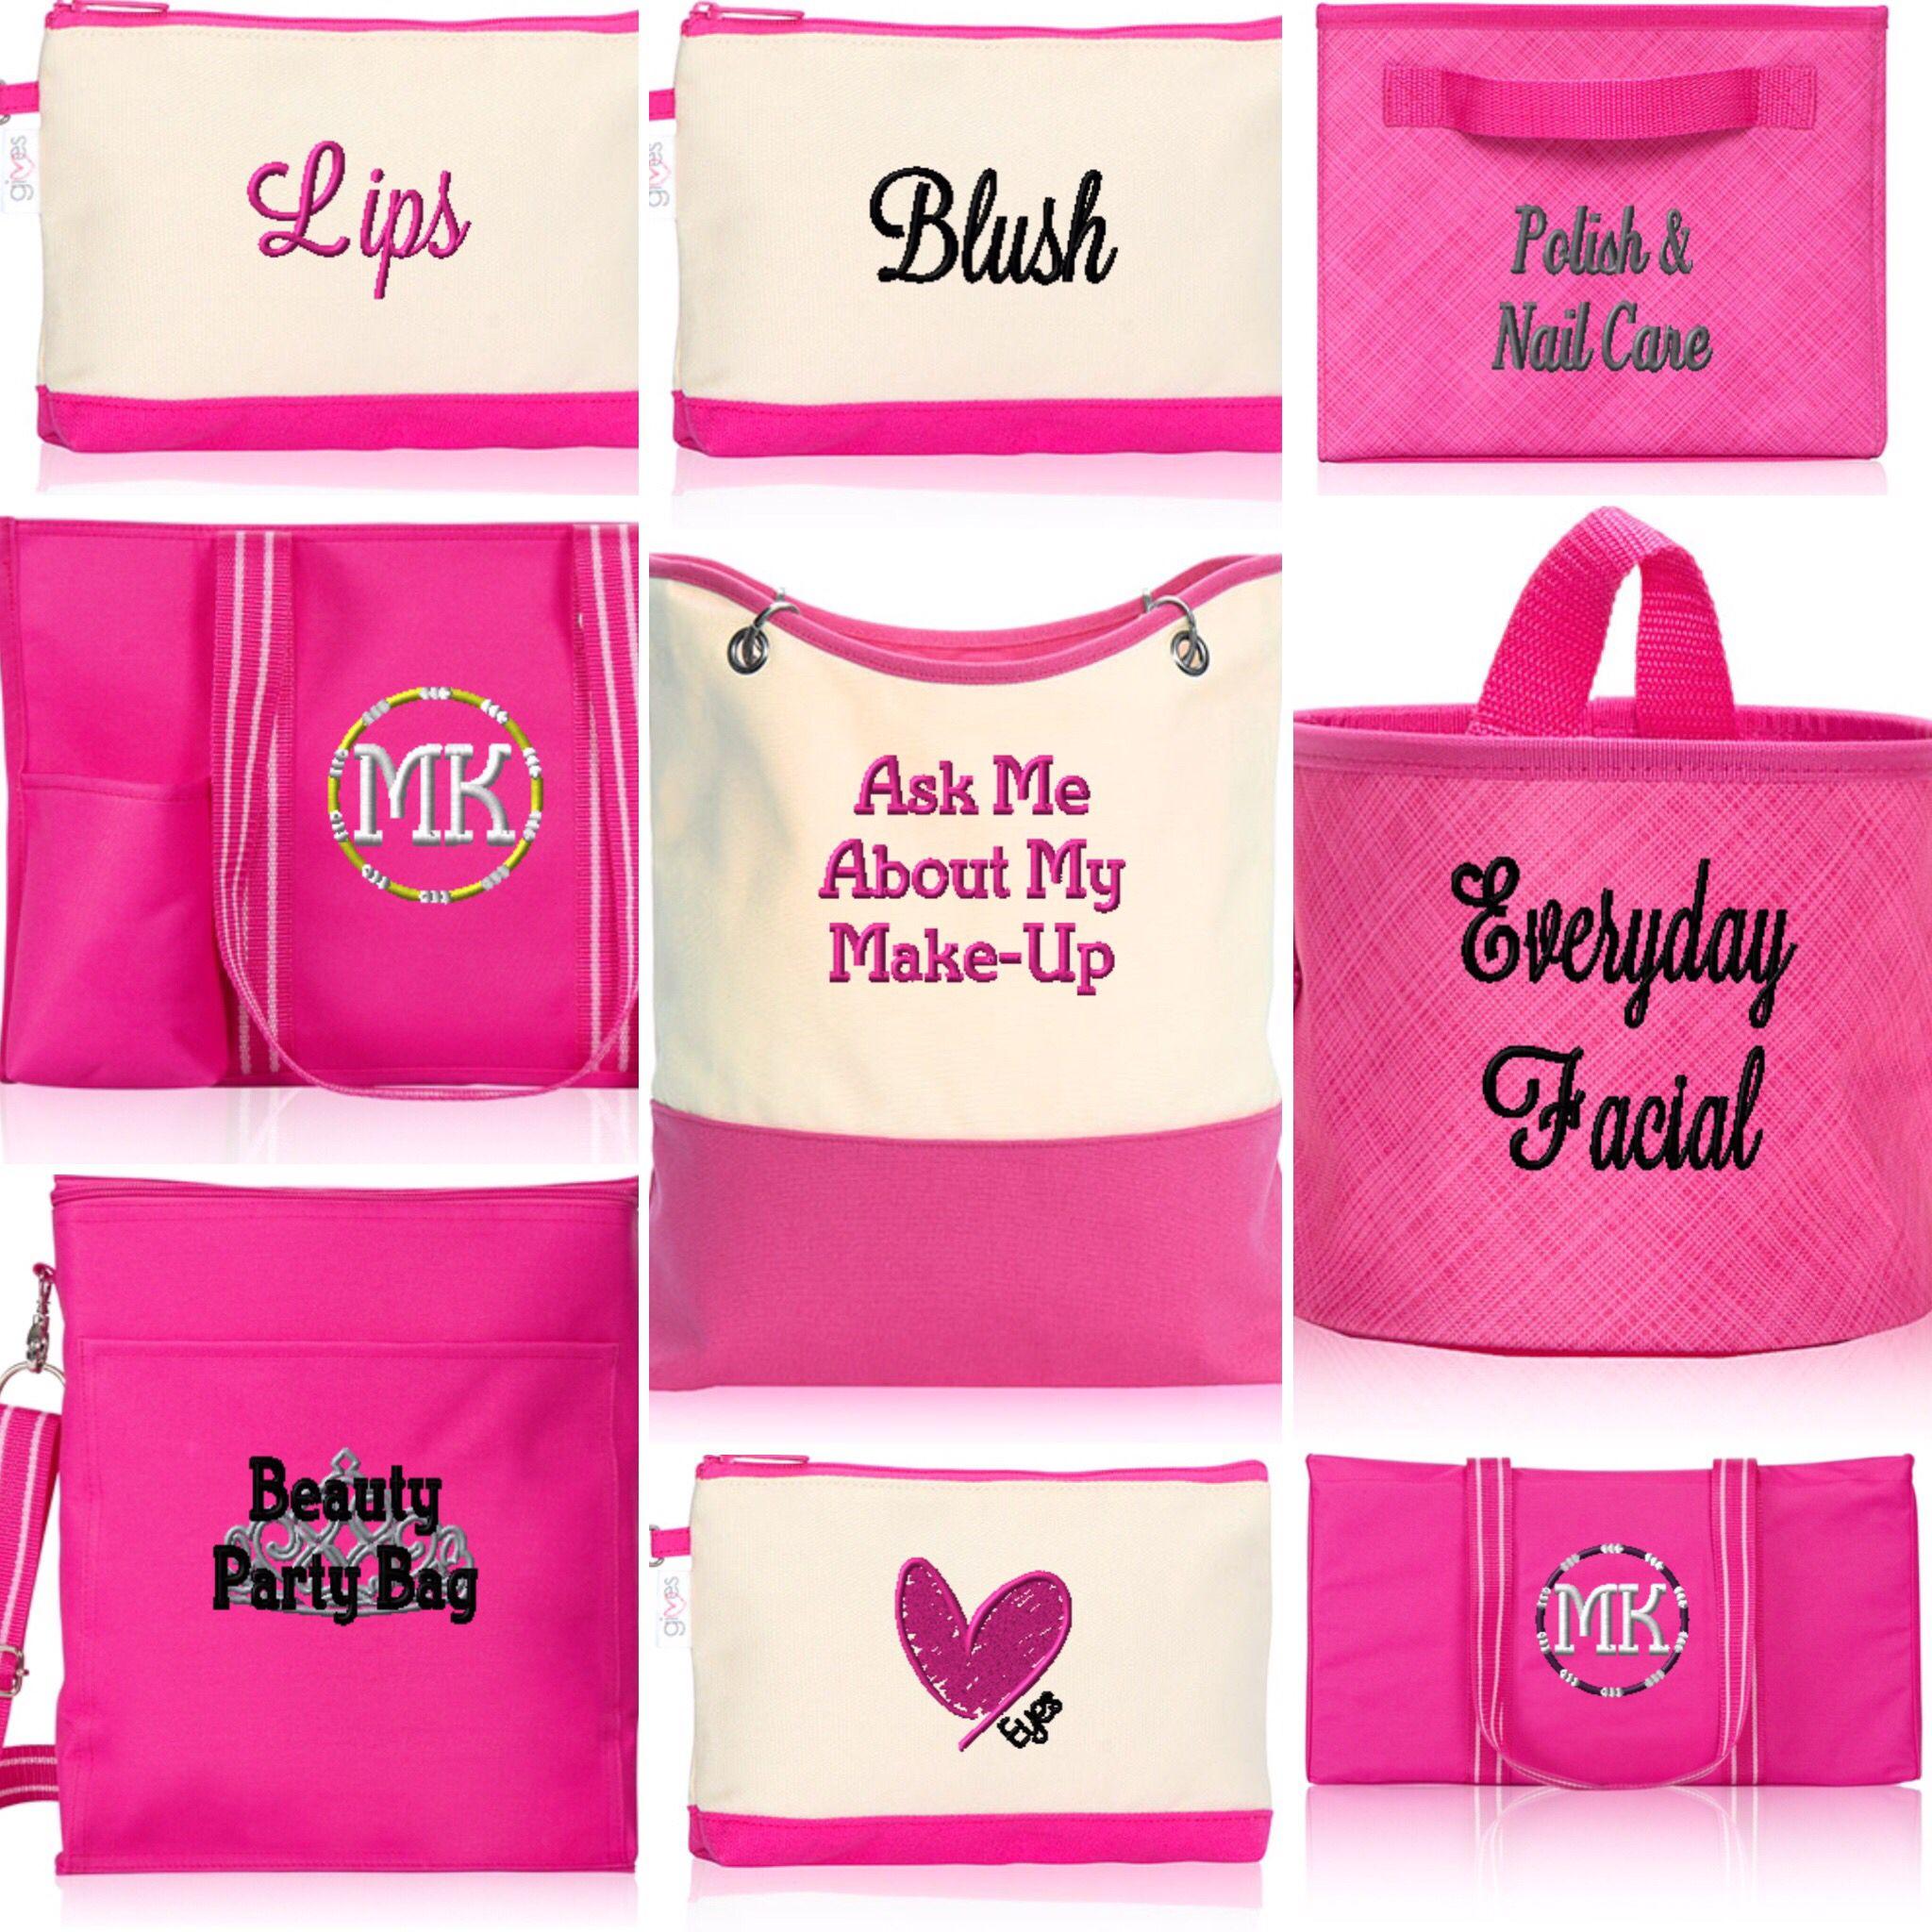 Oh snap bin ideas - Mary Kay Consultant Ideas Using Mini Zipper Pouch Oh Snap Bin Canvas